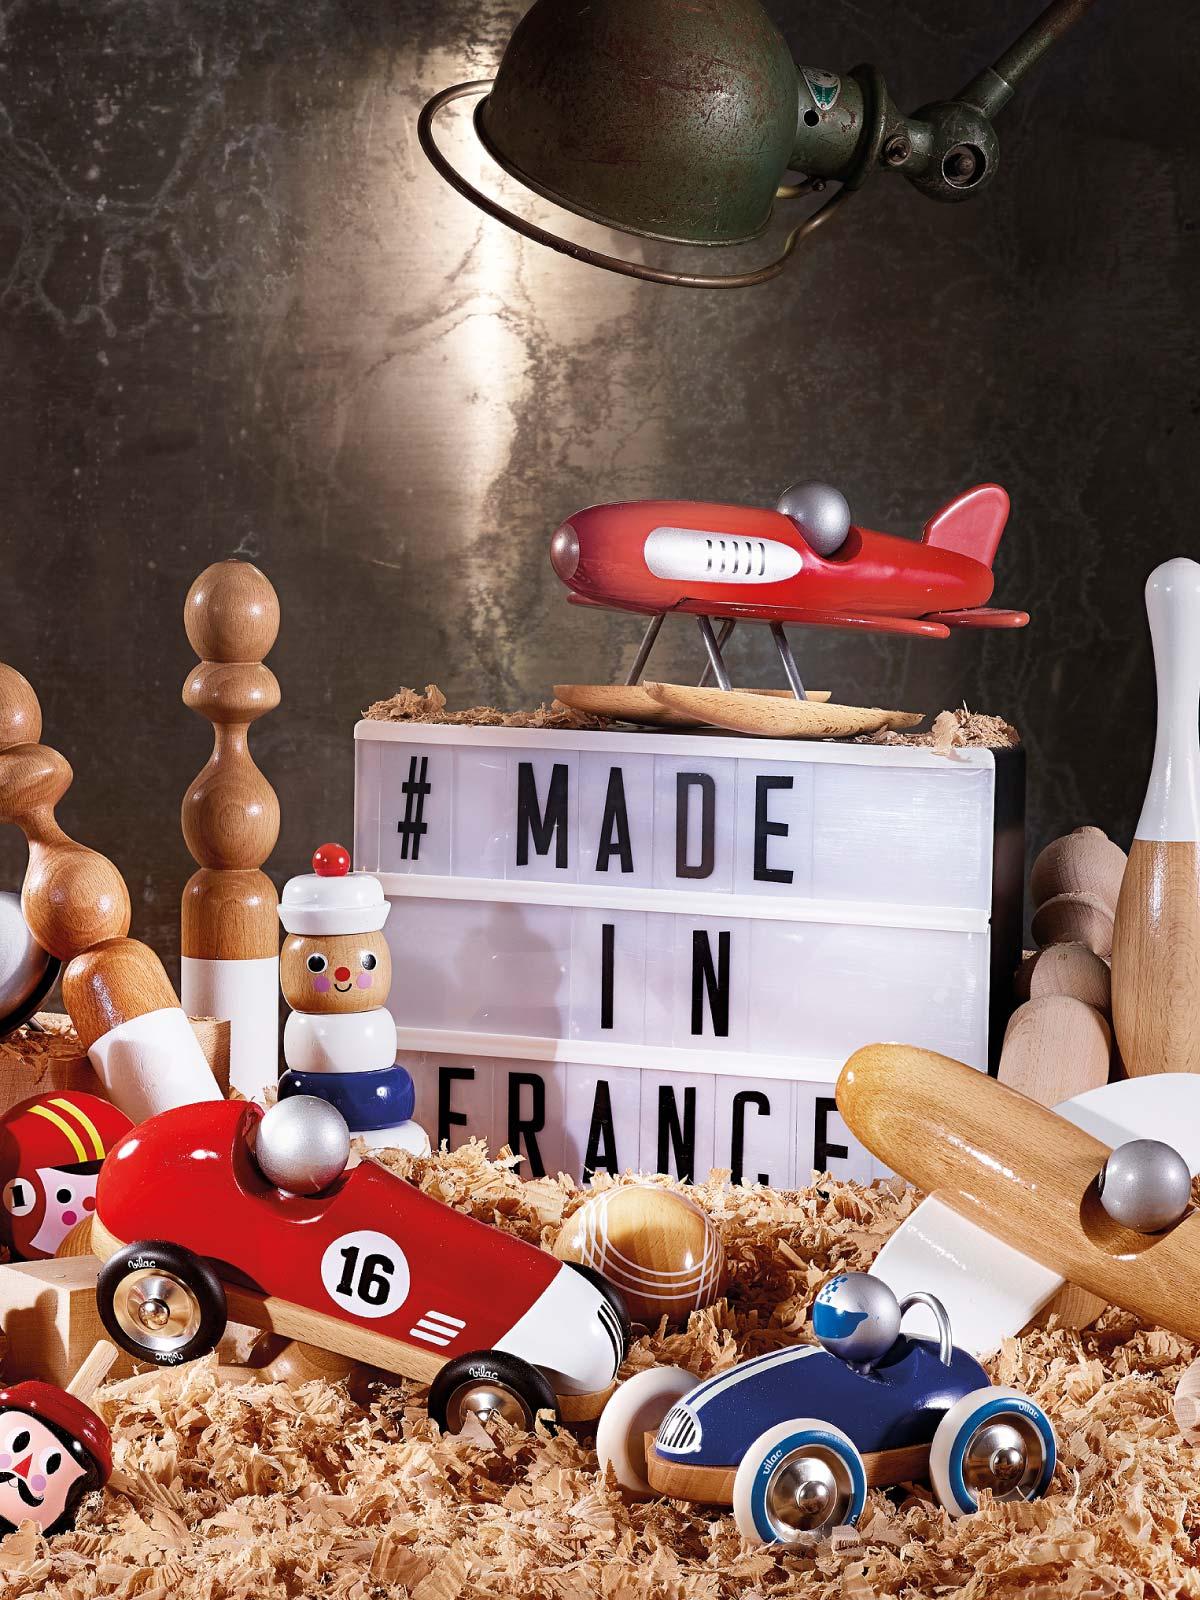 frederickandsophie-toys-vilac-wooden-sea-plane